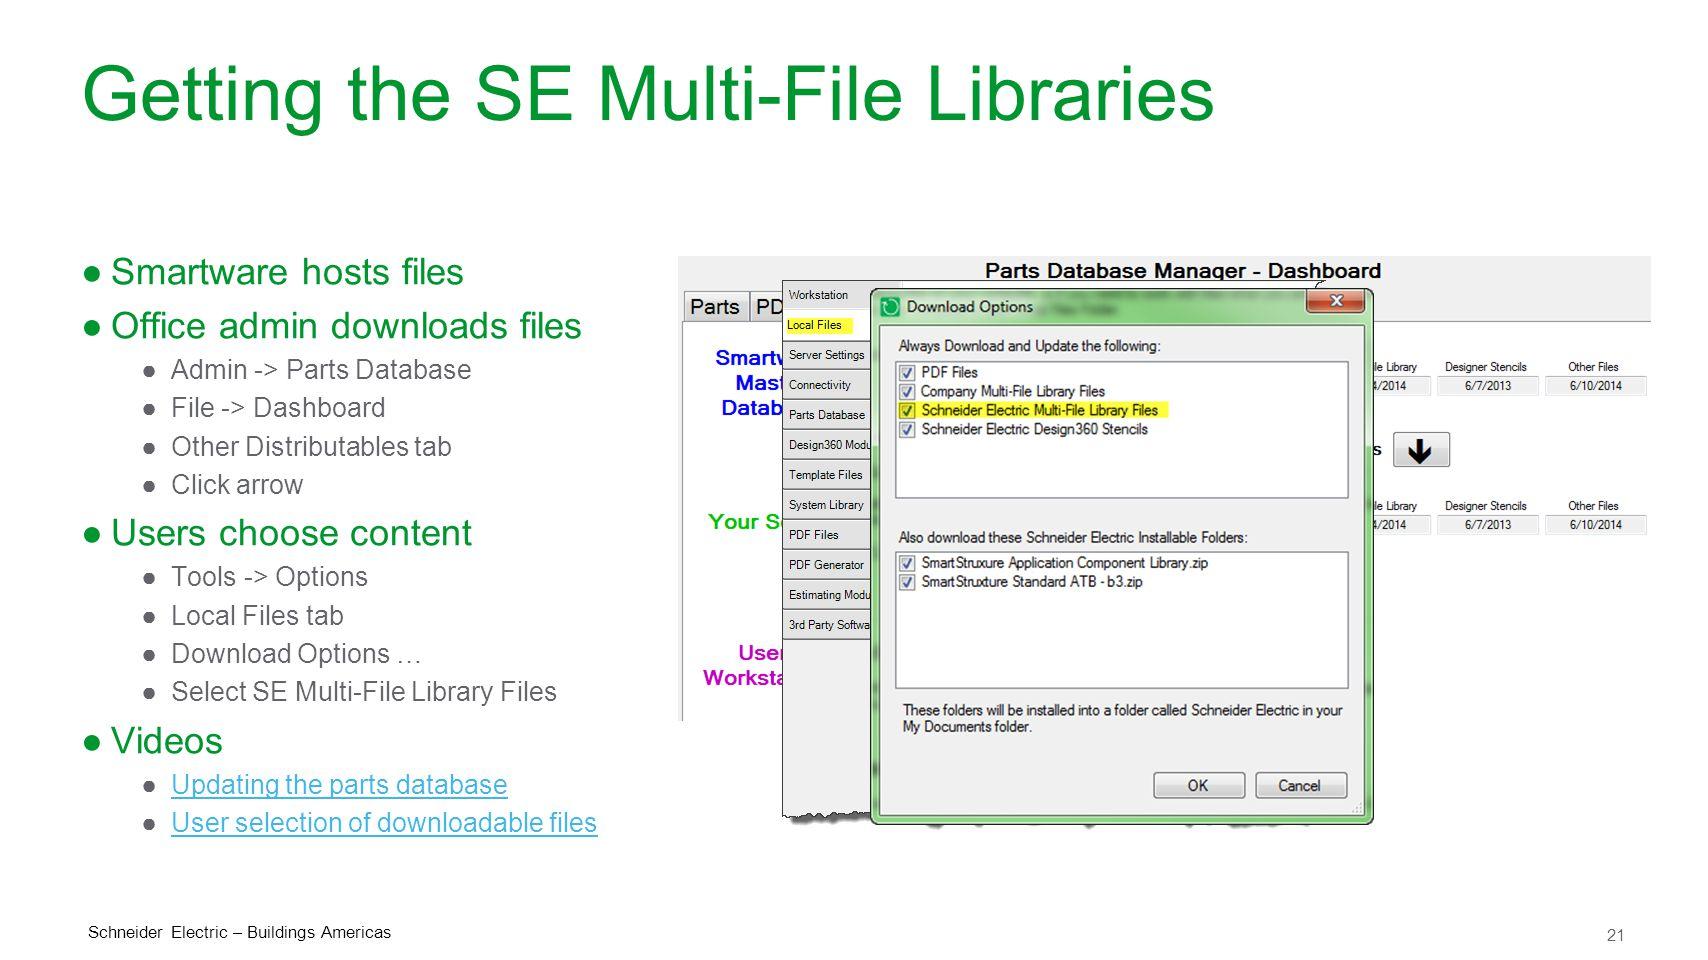 21 Schneider Electric – Buildings Americas Getting the SE Multi-File Libraries ●Smartware hosts files ●Office admin downloads files ●Admin -> Parts Da